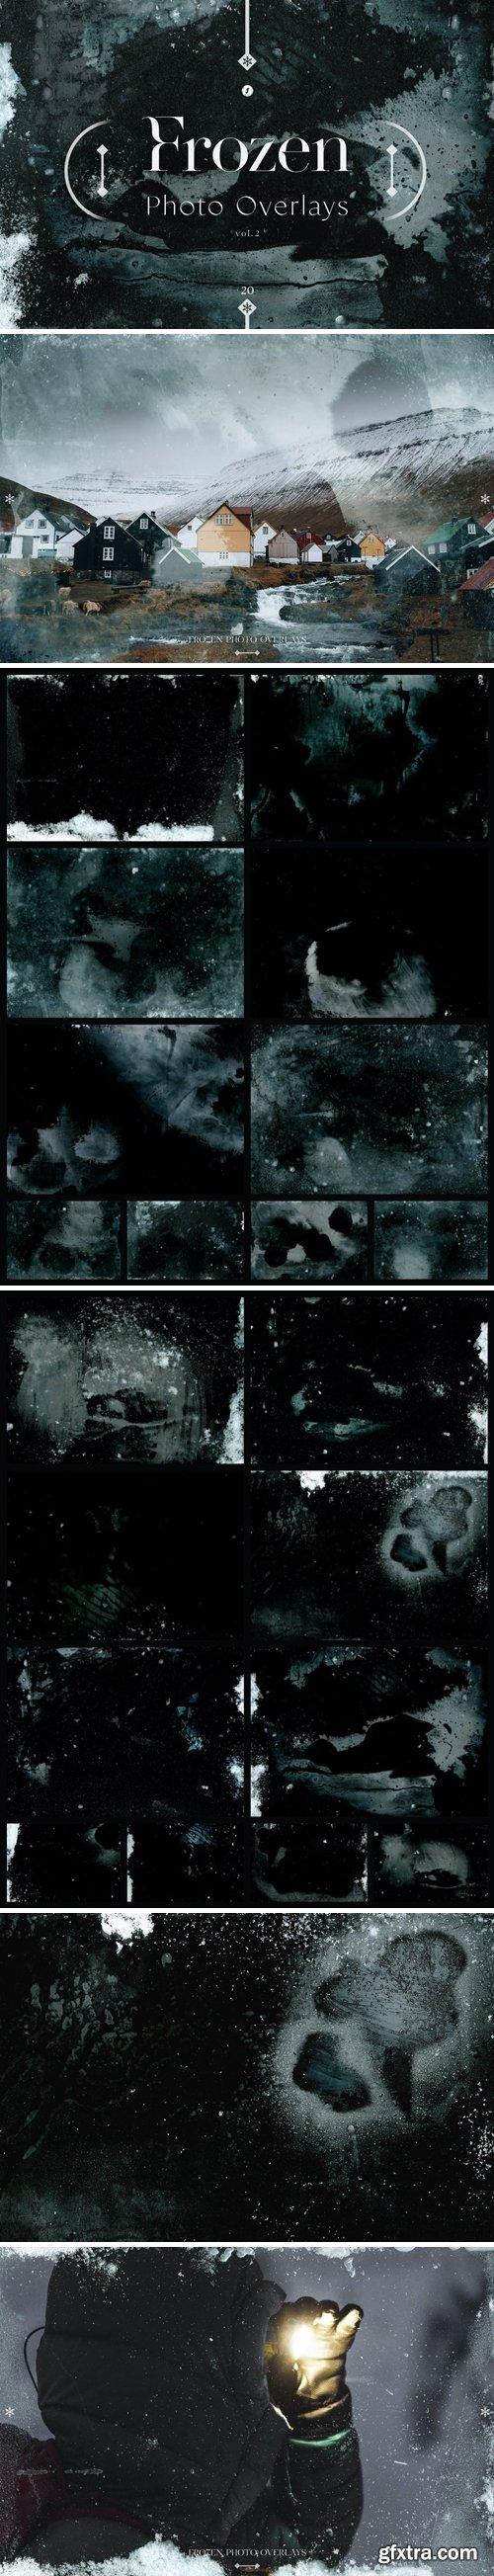 Frozen Photo Overlays Vol. 2